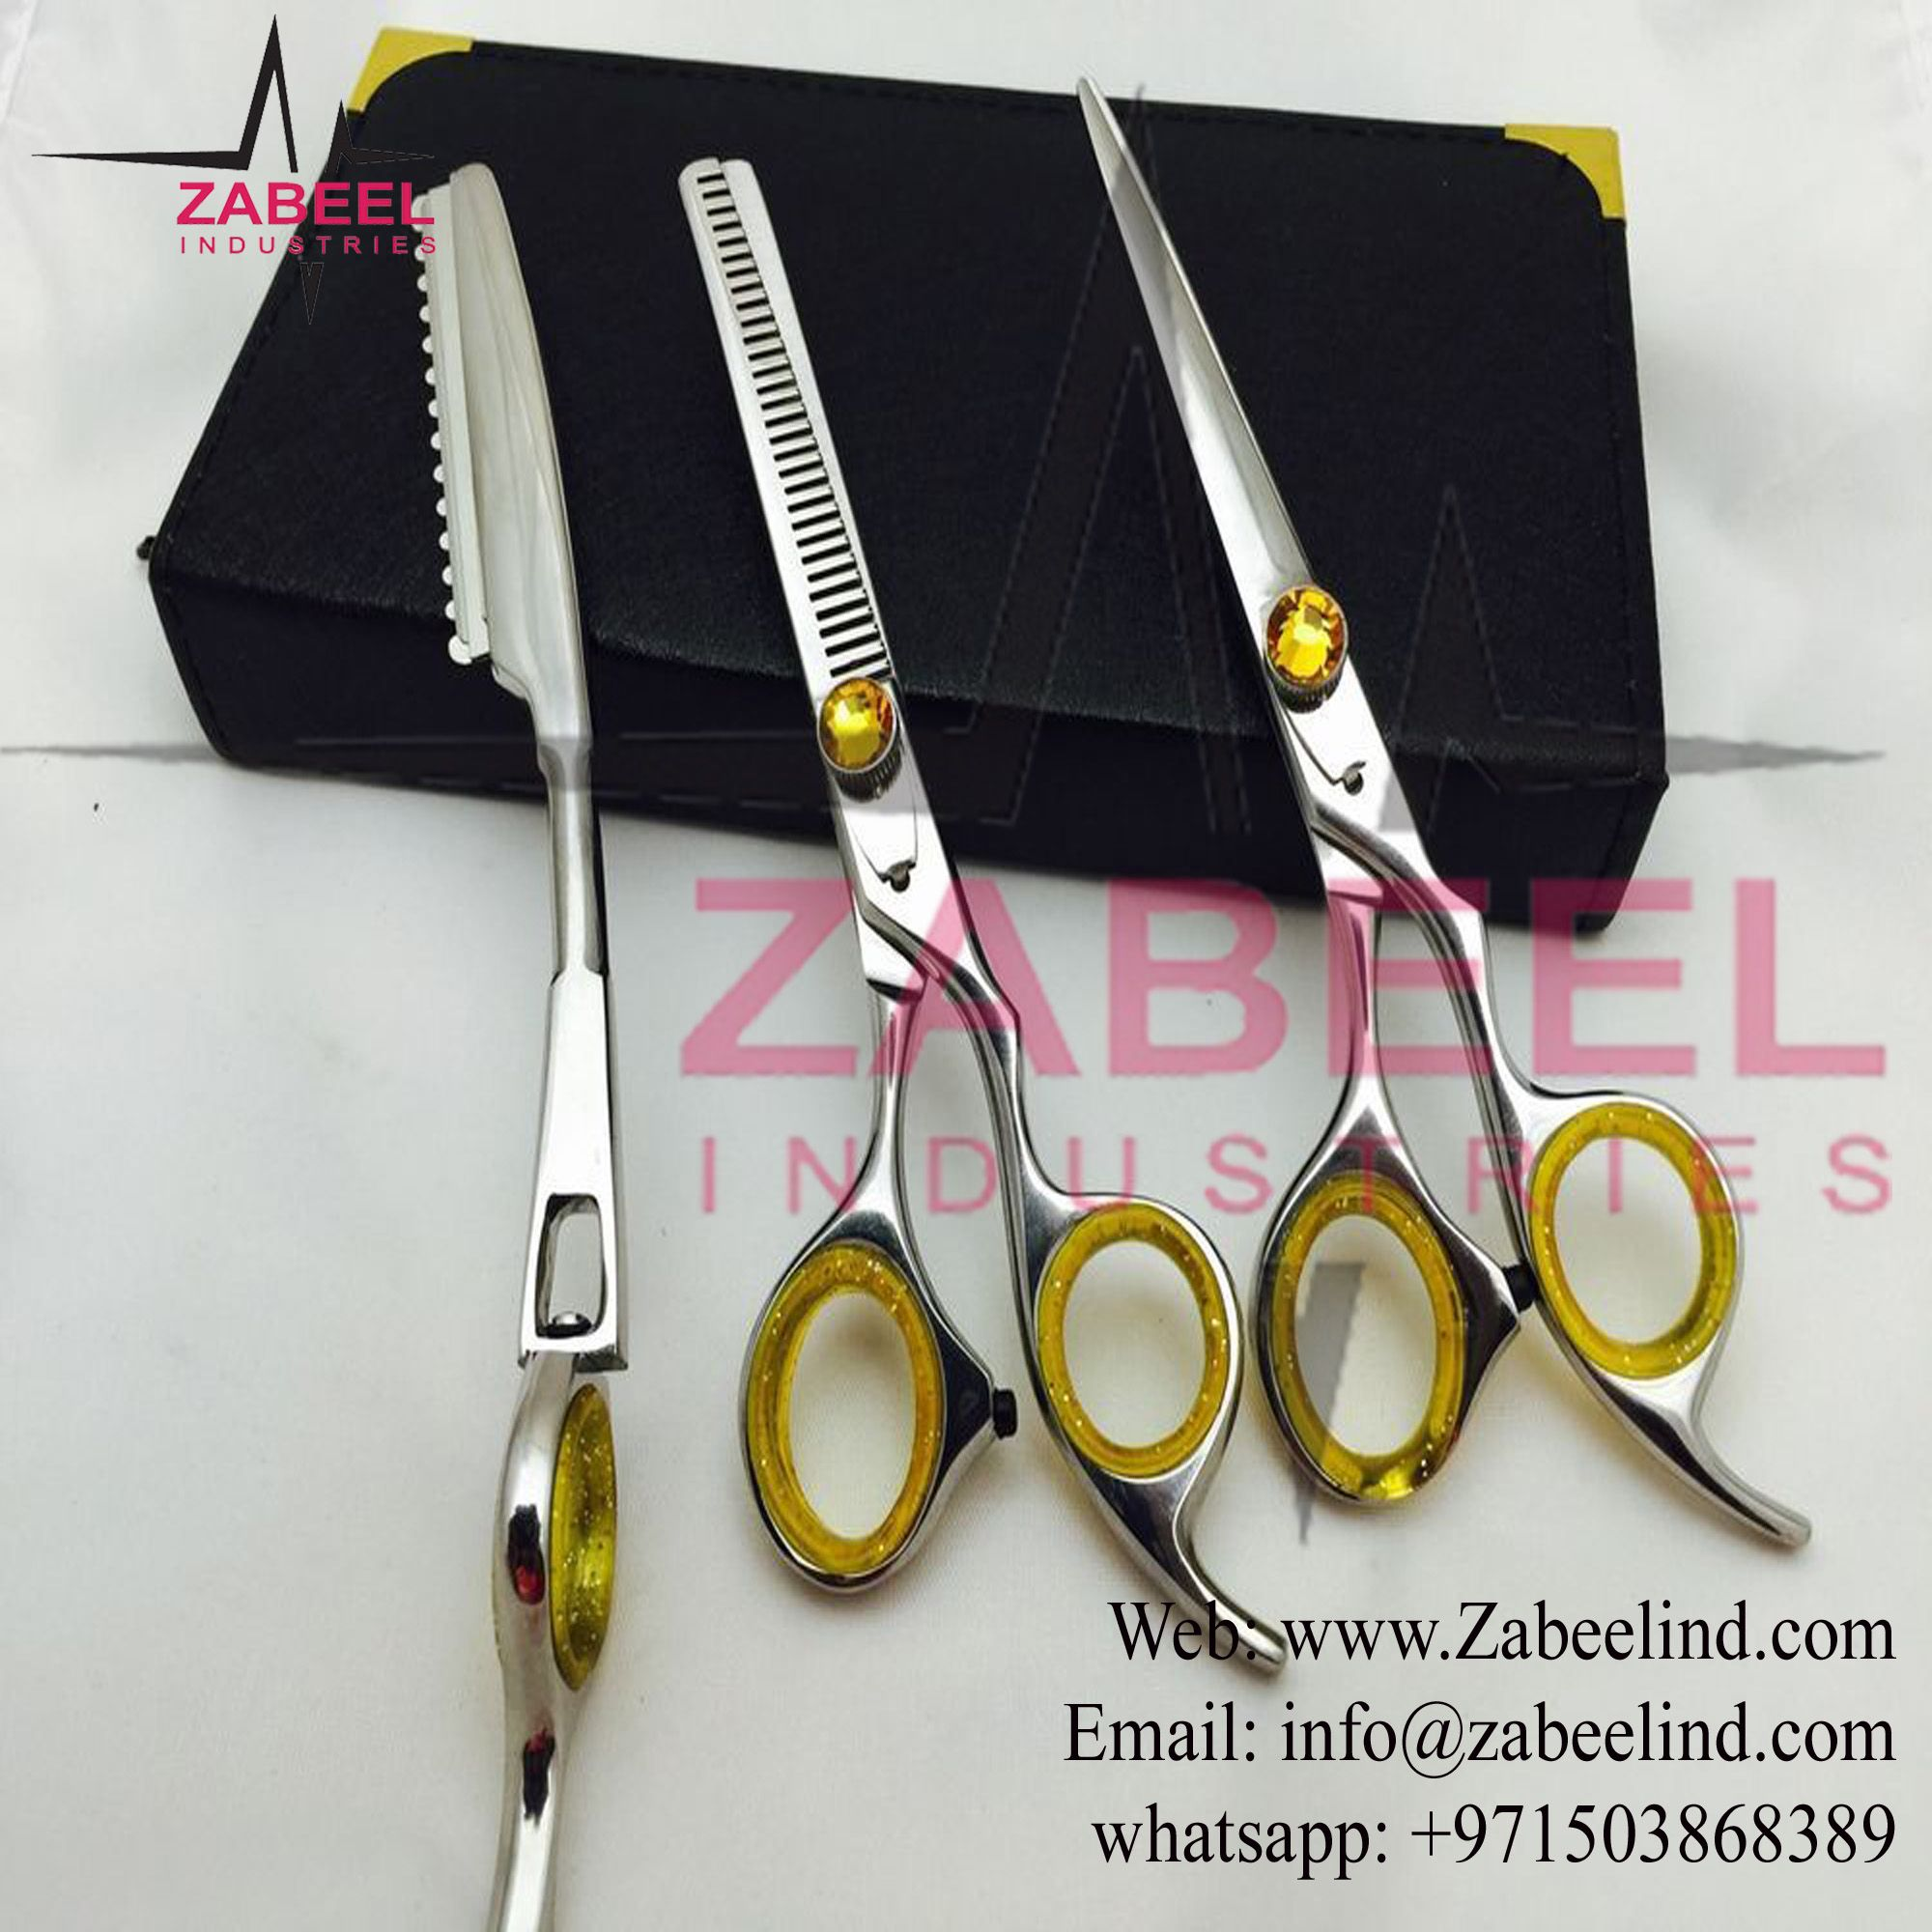 Pin On Zabeel Industries